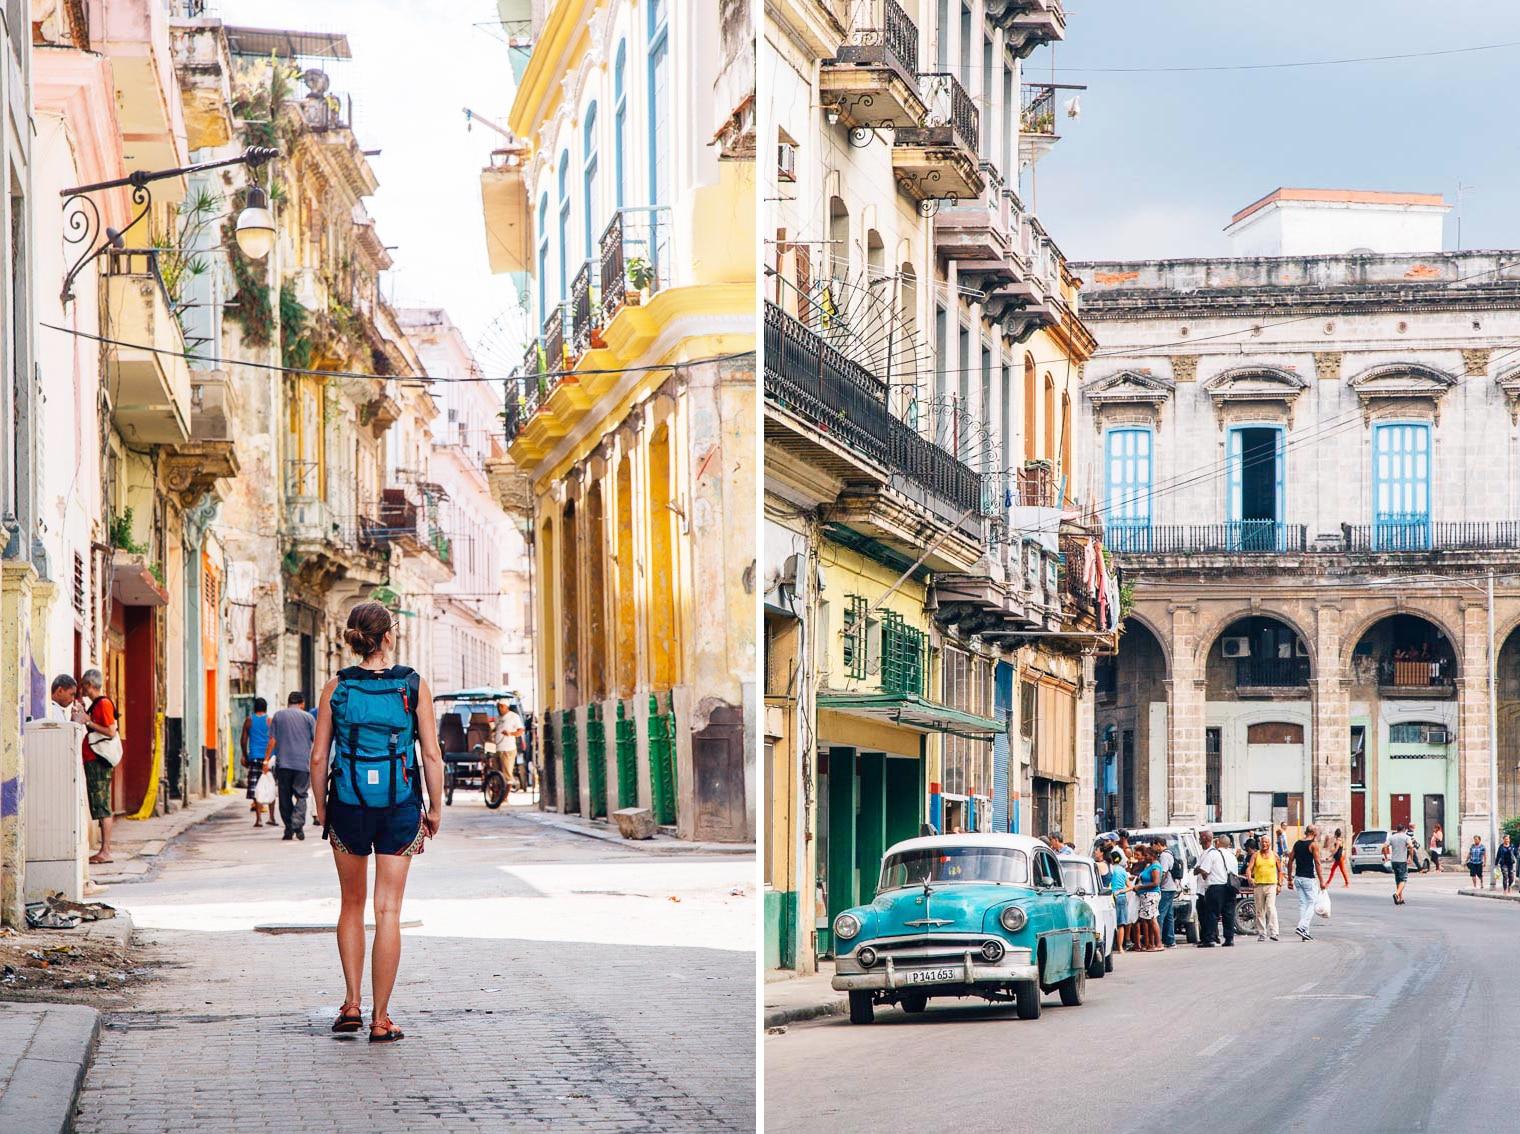 Exploring-Old-Havana-Cuba-1.jpg